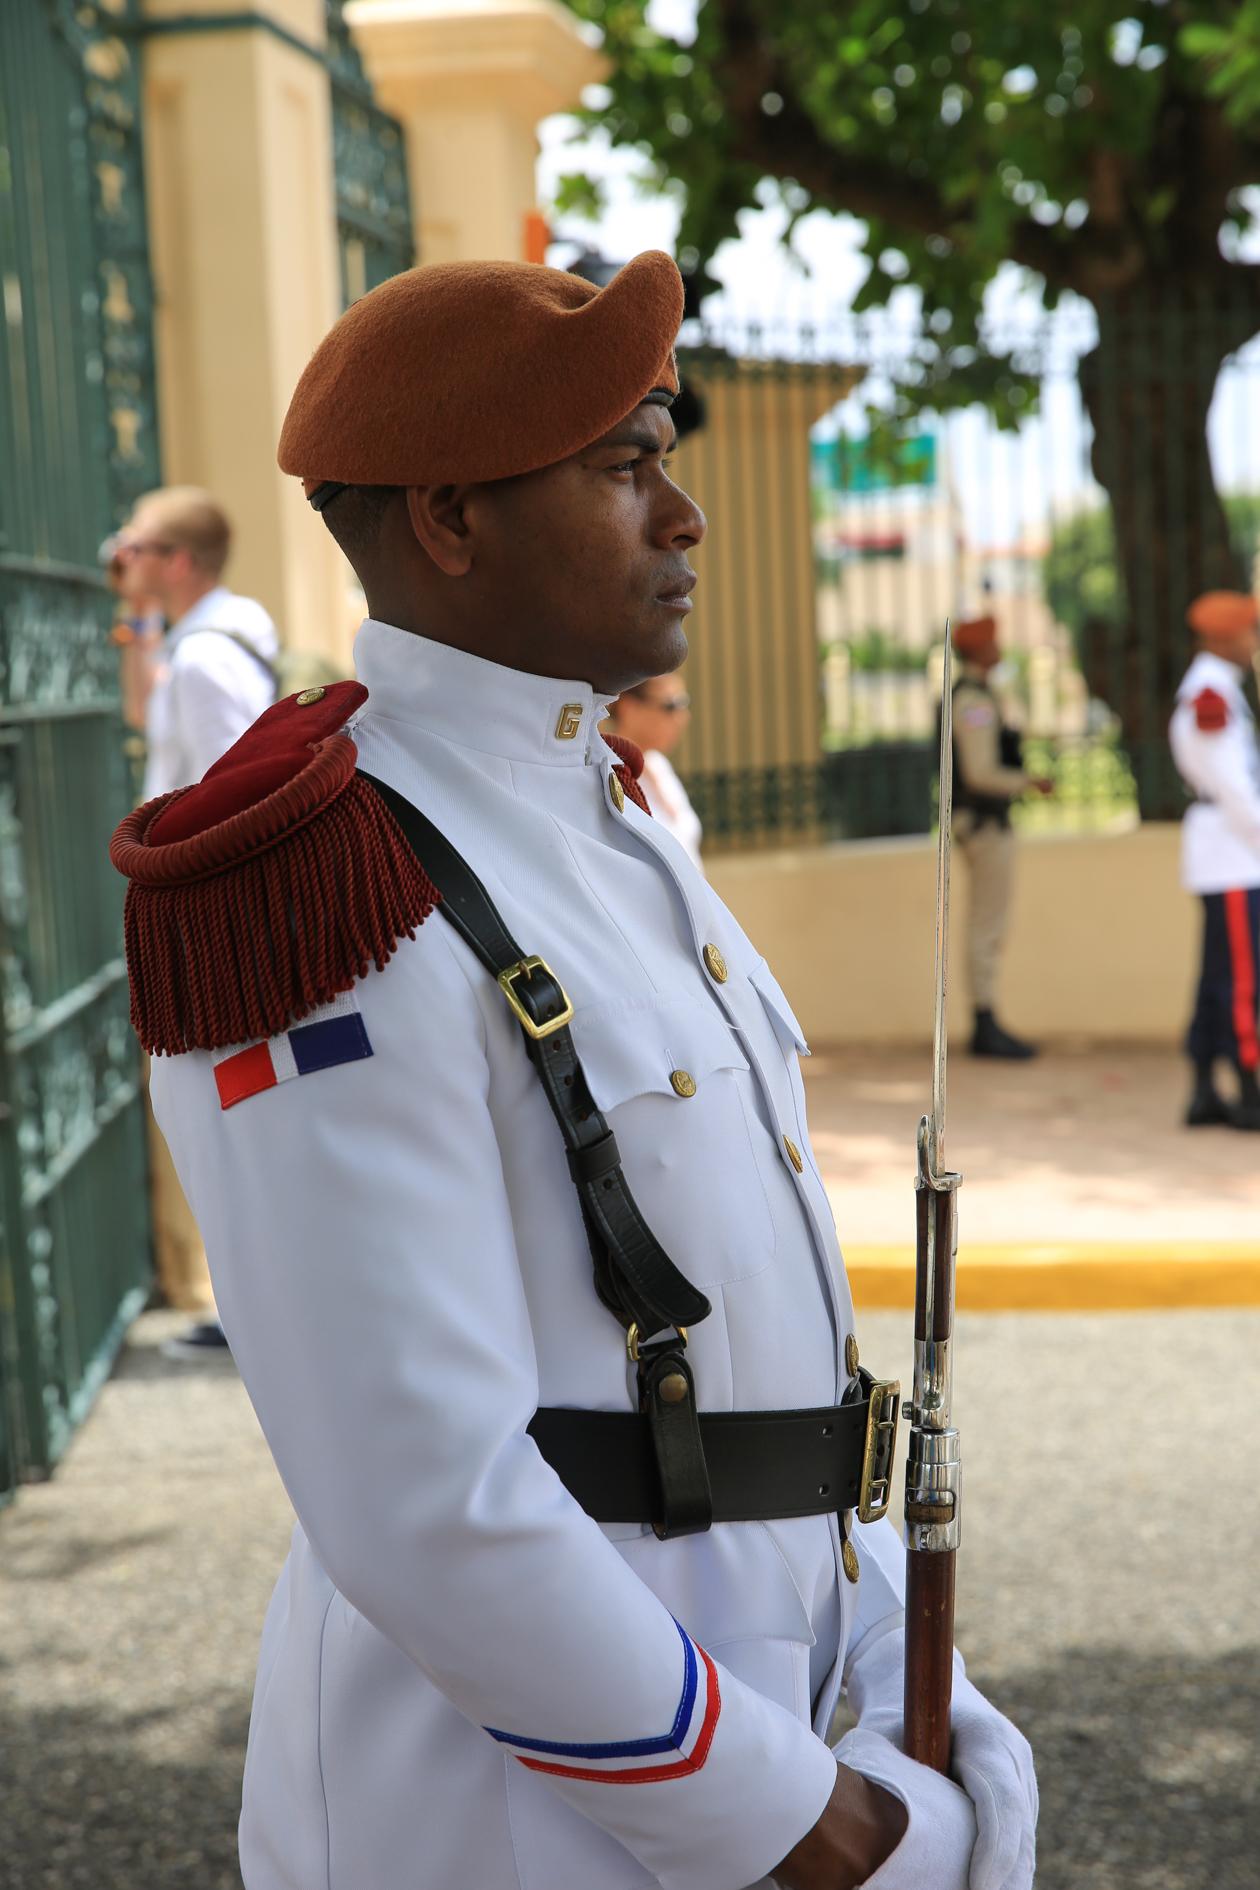 santodomingo-nationaal-paleis-erewacht